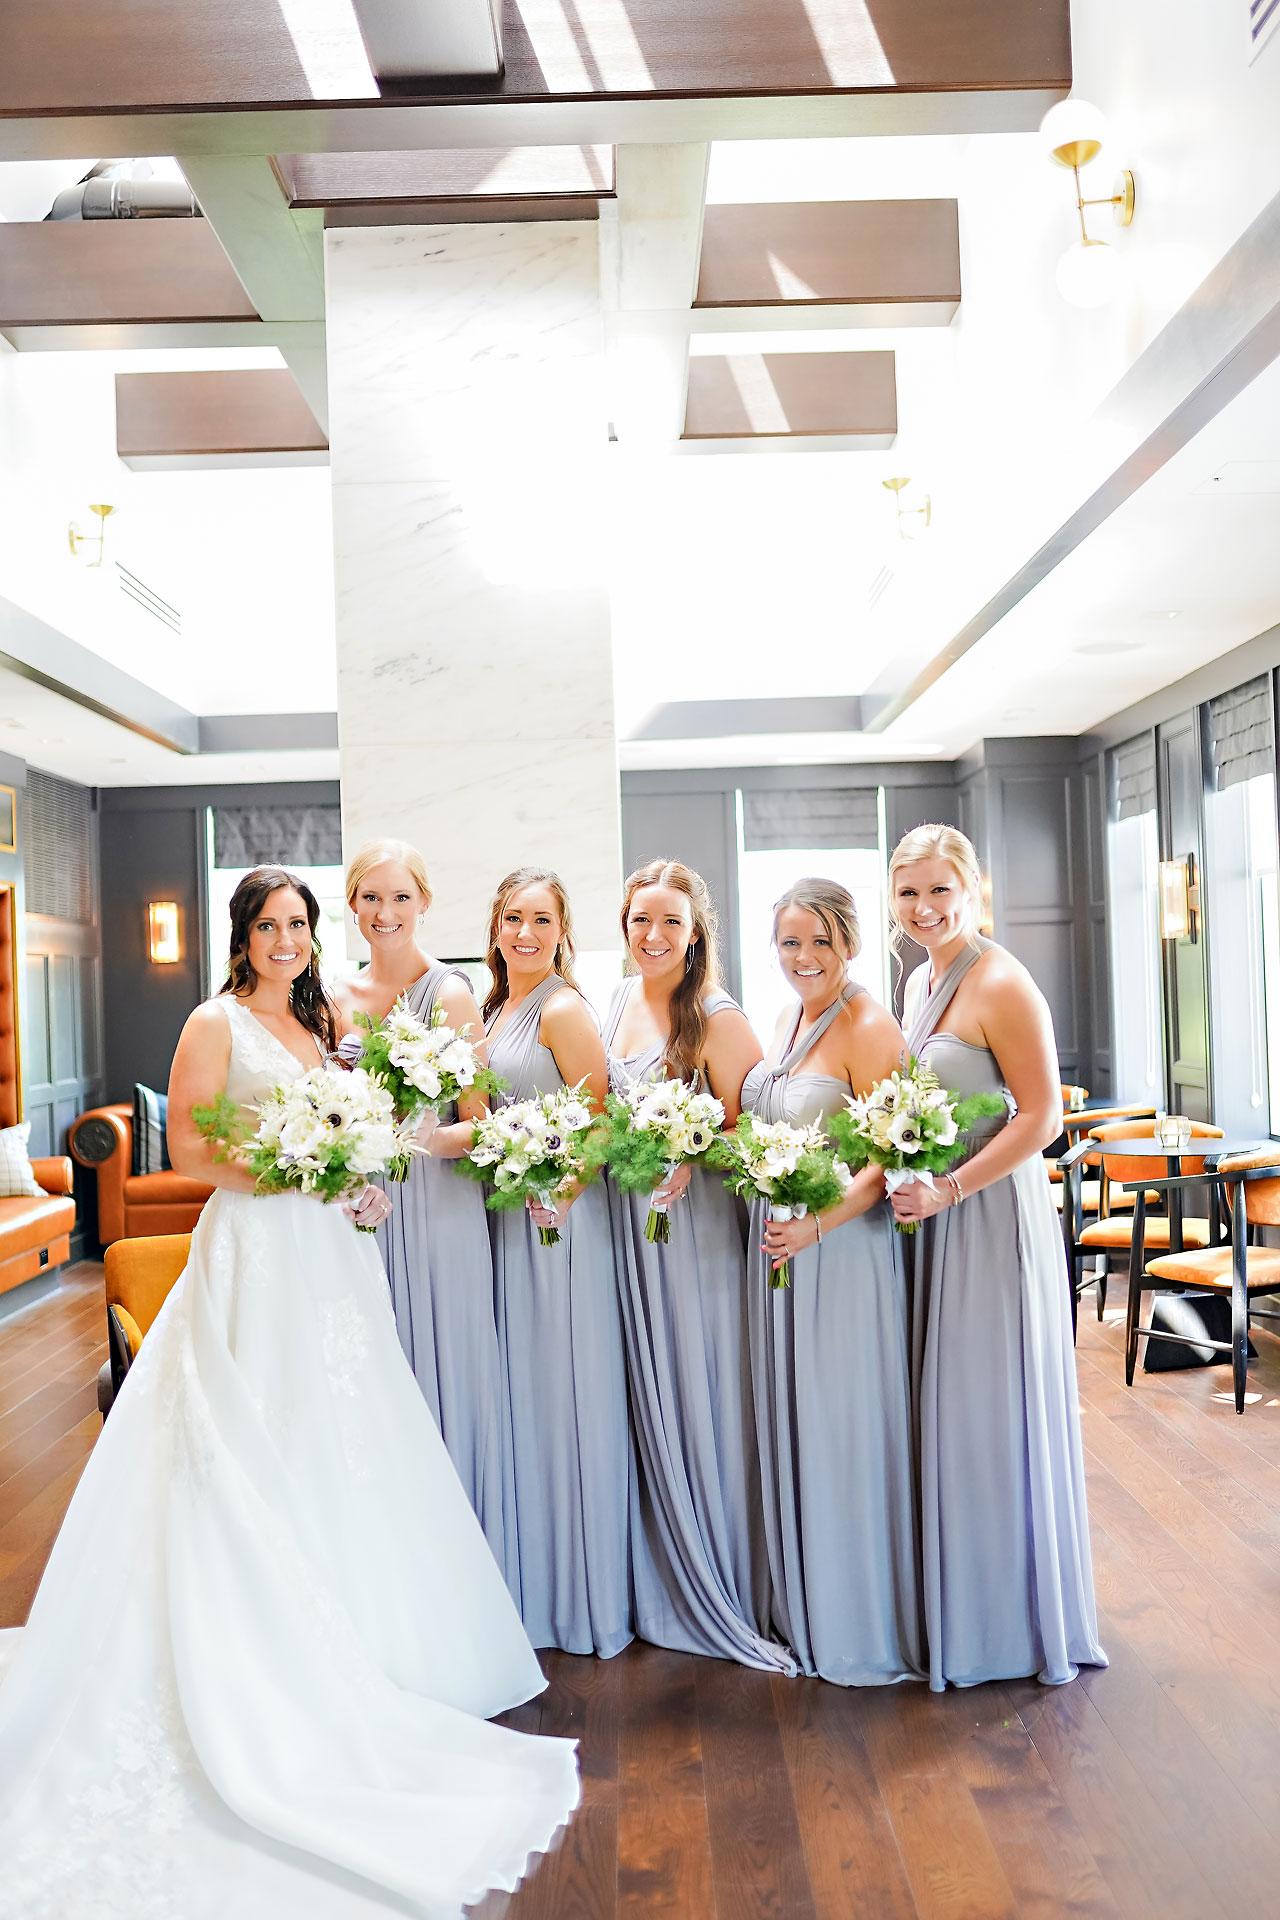 MacKinze John Lafayette Indiana Purdue Wedding 086